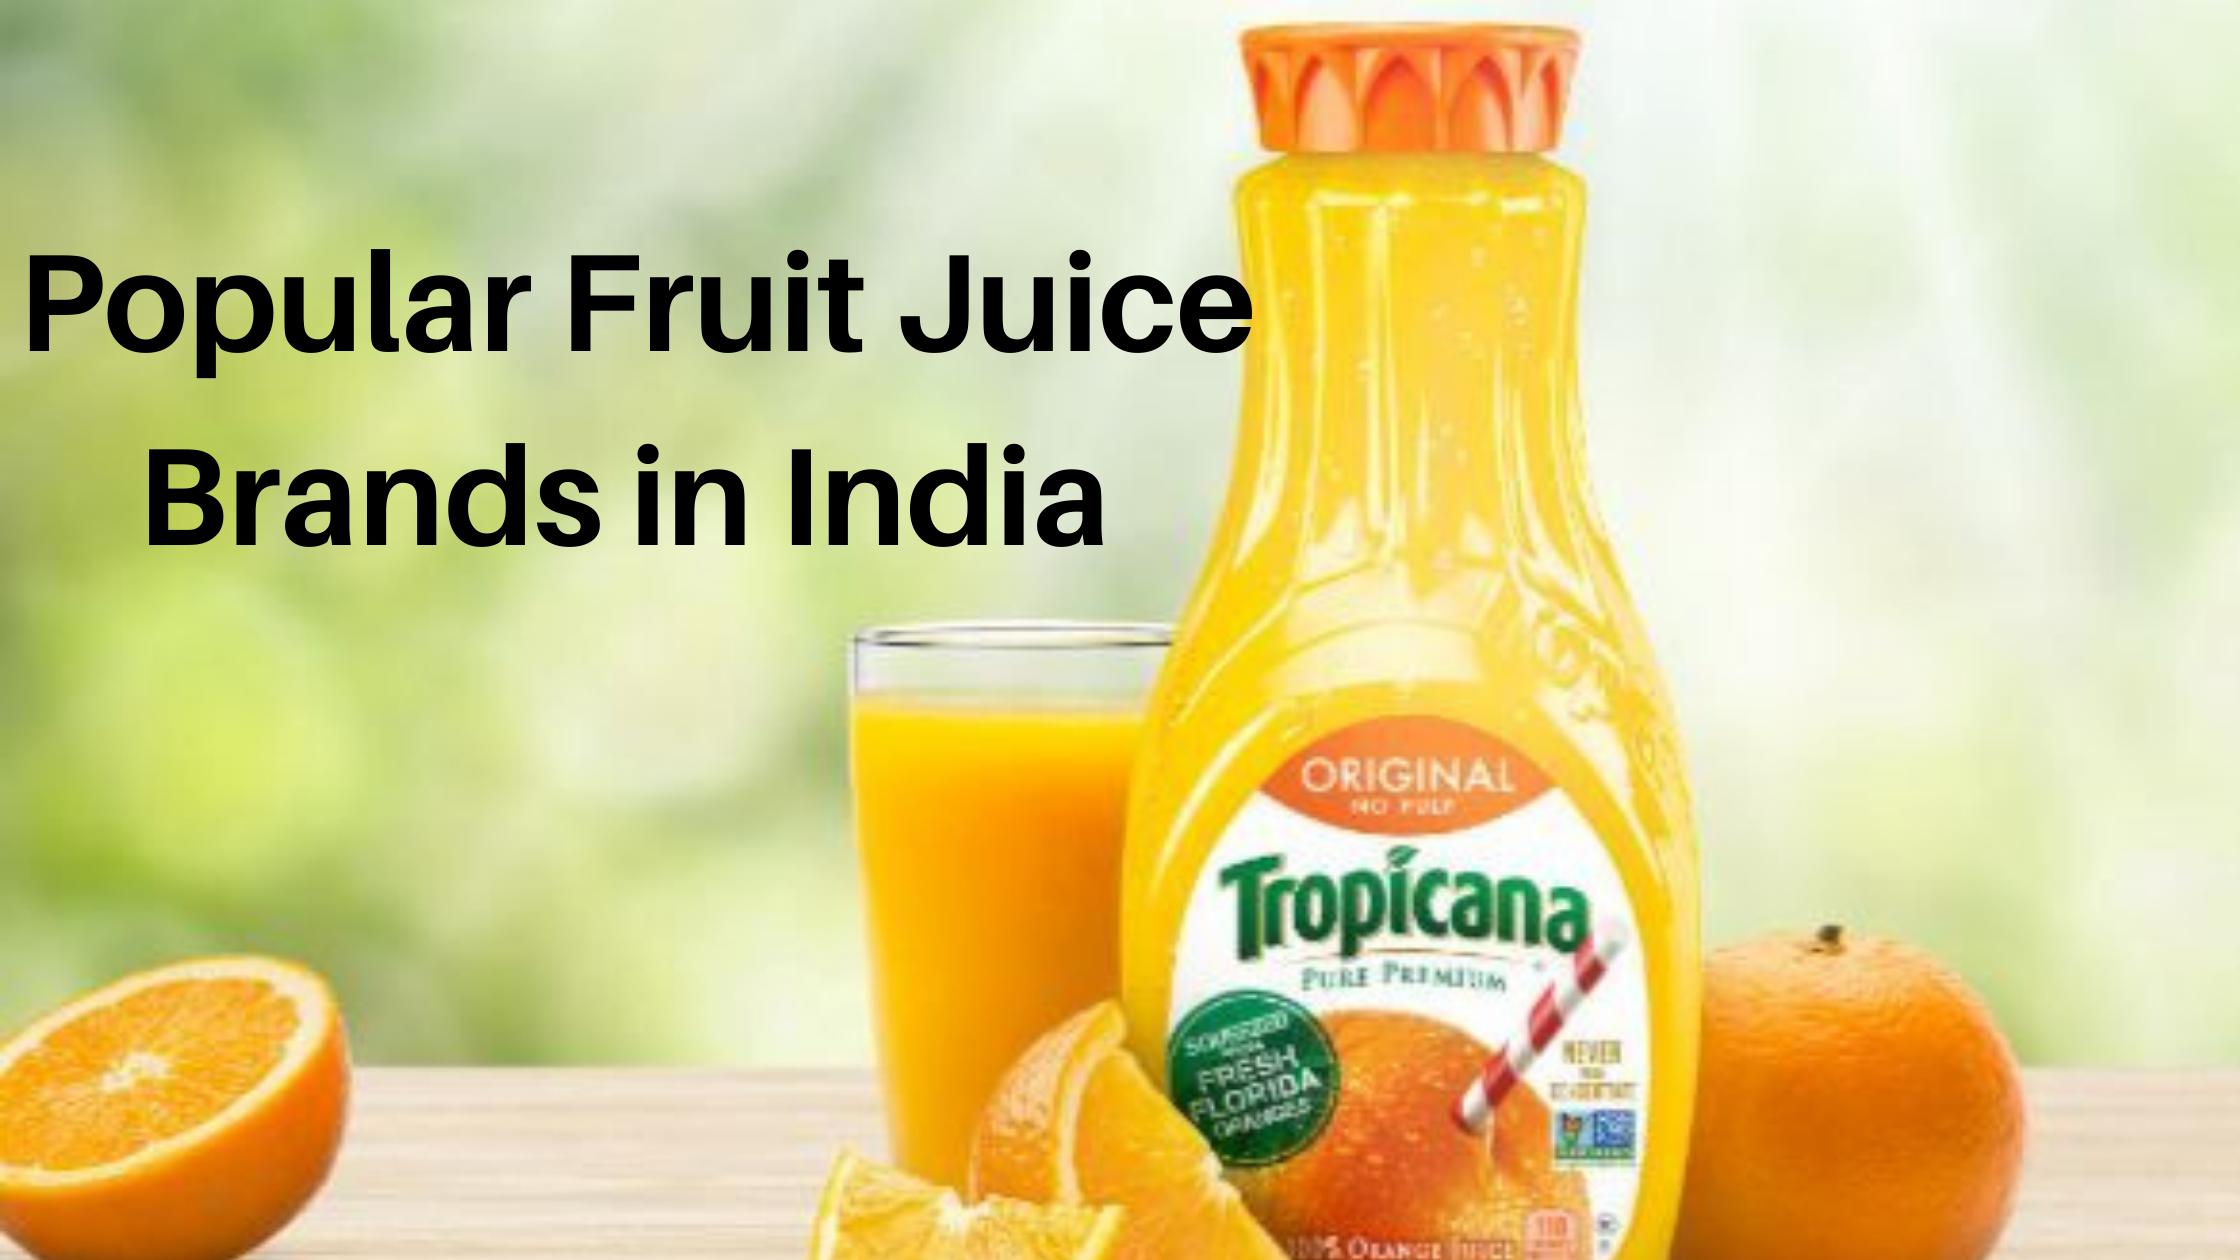 Popular Fruit Juice Brand in India